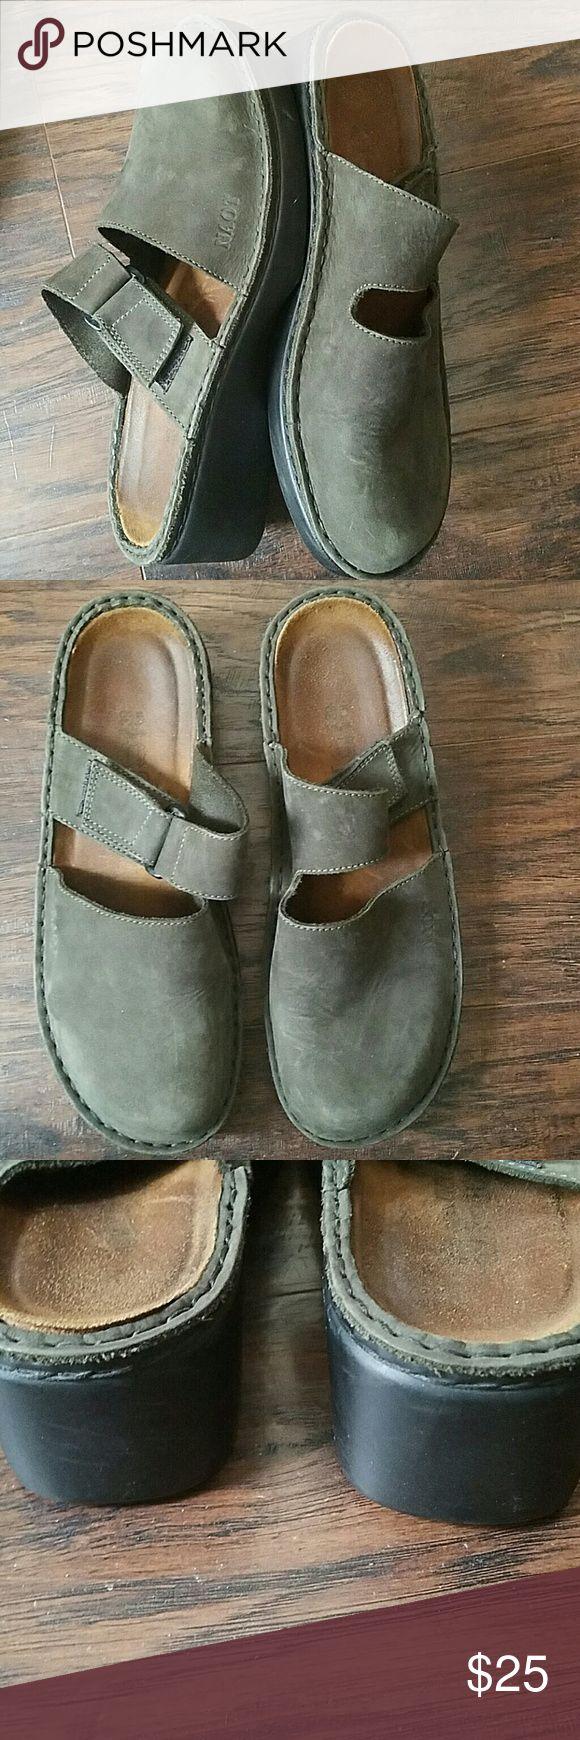 Selling this NAOT MULES CLOGS COMFORT SHOE SIZE 8 / 38 on Poshmark! My username is: bobbiaughtry. #shopmycloset #poshmark #fashion #shopping #style #forsale #naot #Shoes